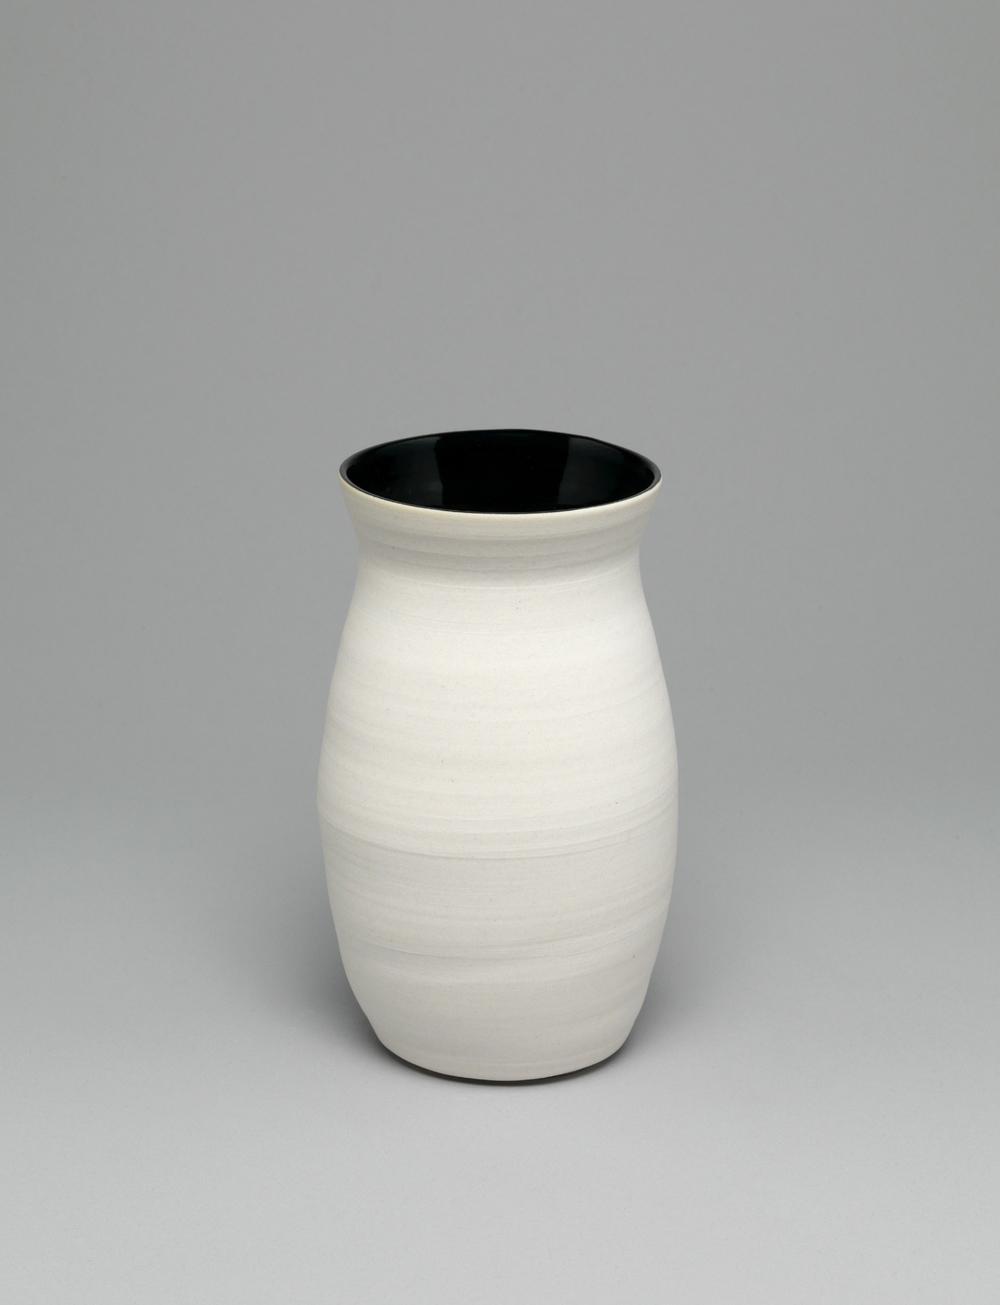 Shio Kusaka  Untitled (hole 7)  2011 Porcelain 7 1/4h x 4 1/2w x 4 1/2d in SK303